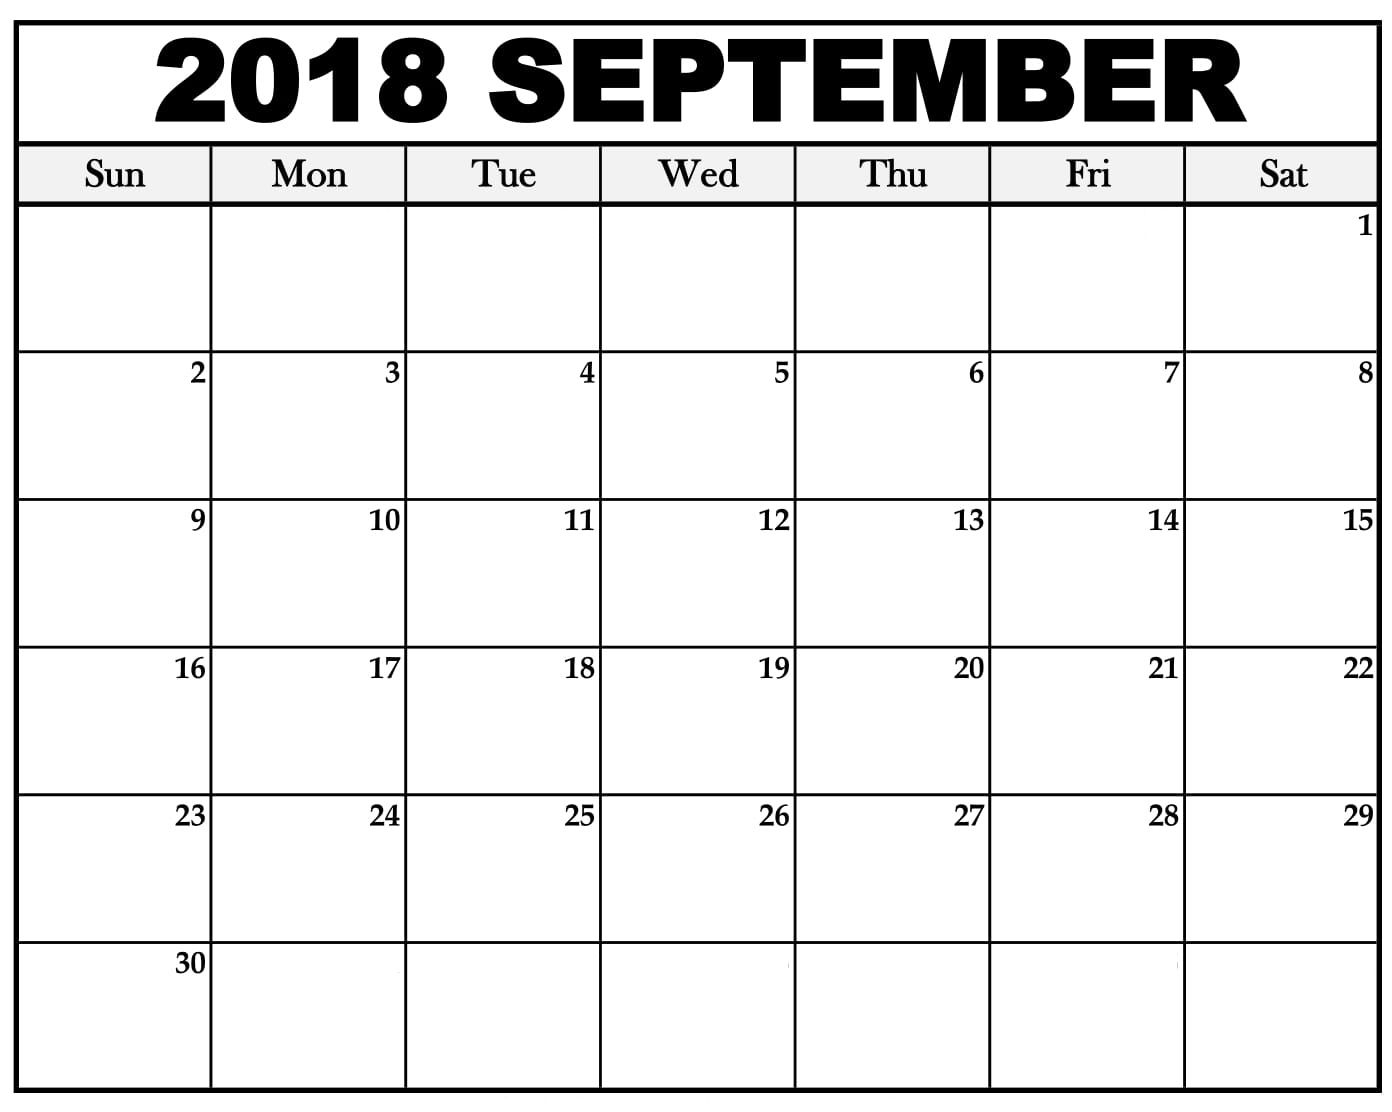 September 2018 Calendar Printable Template   September 2018 Calendar for September Calendar Printable Template